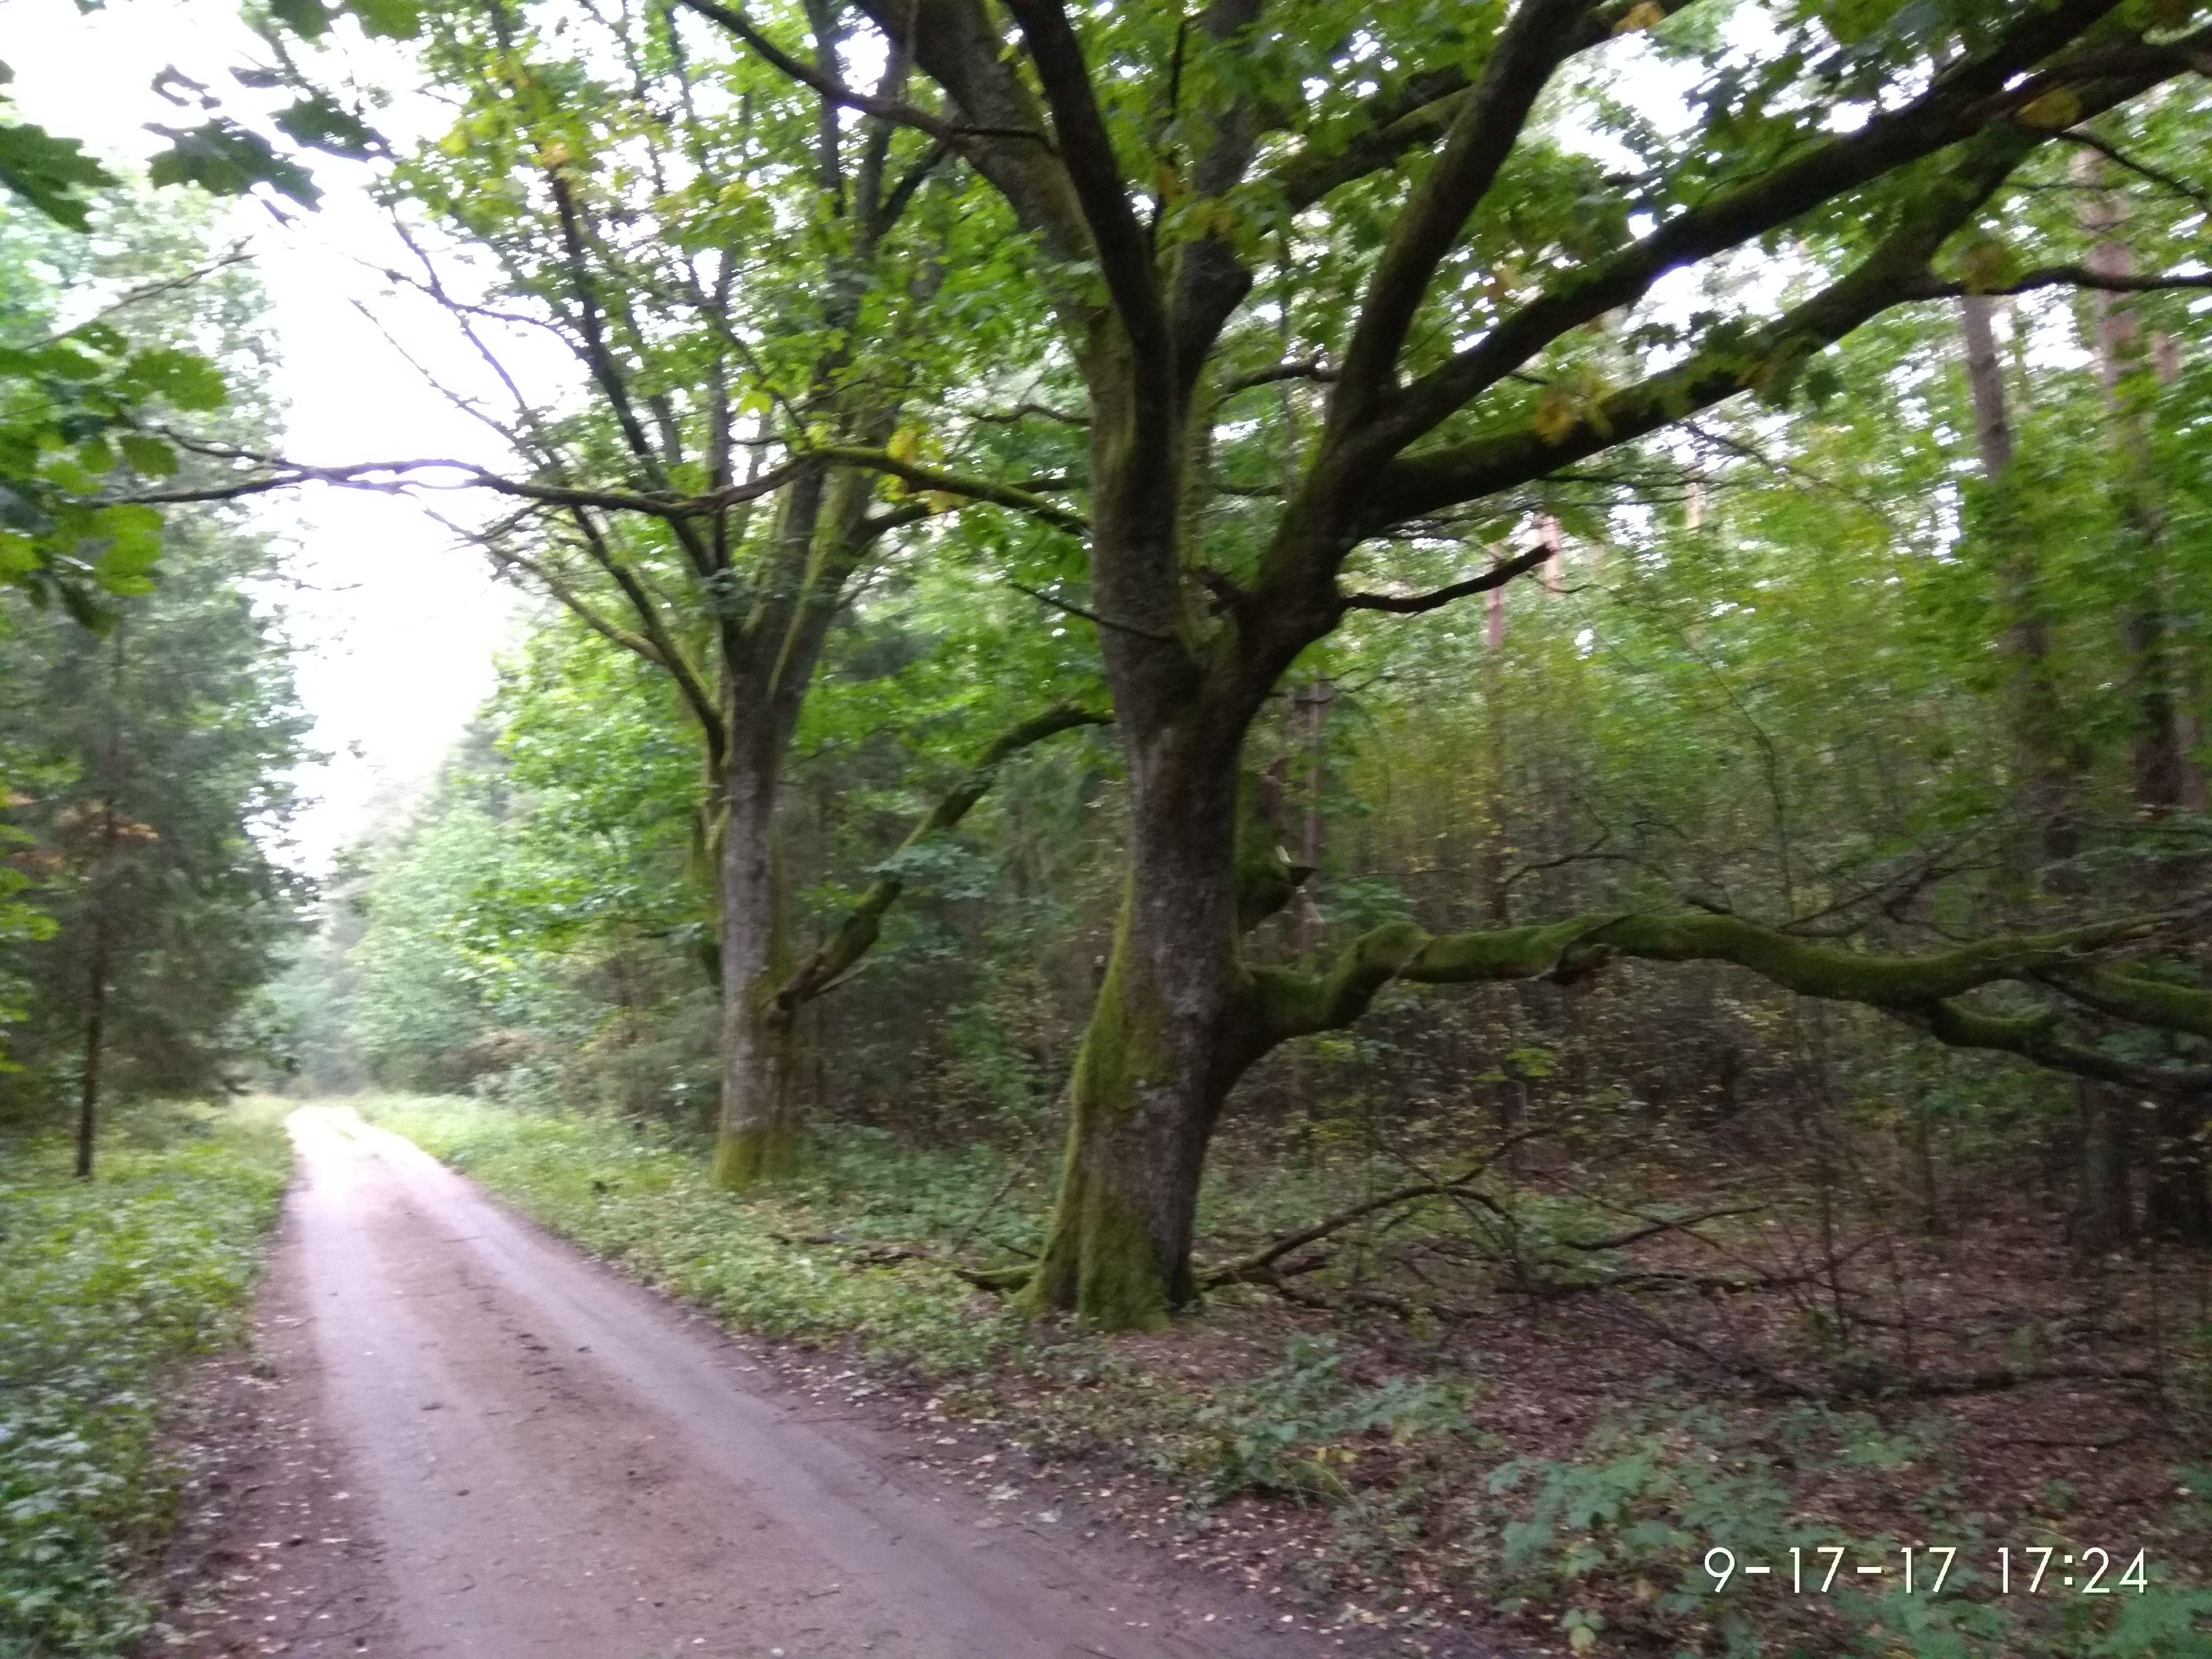 Pin by jotka on Foto užrašai Country roads, Country